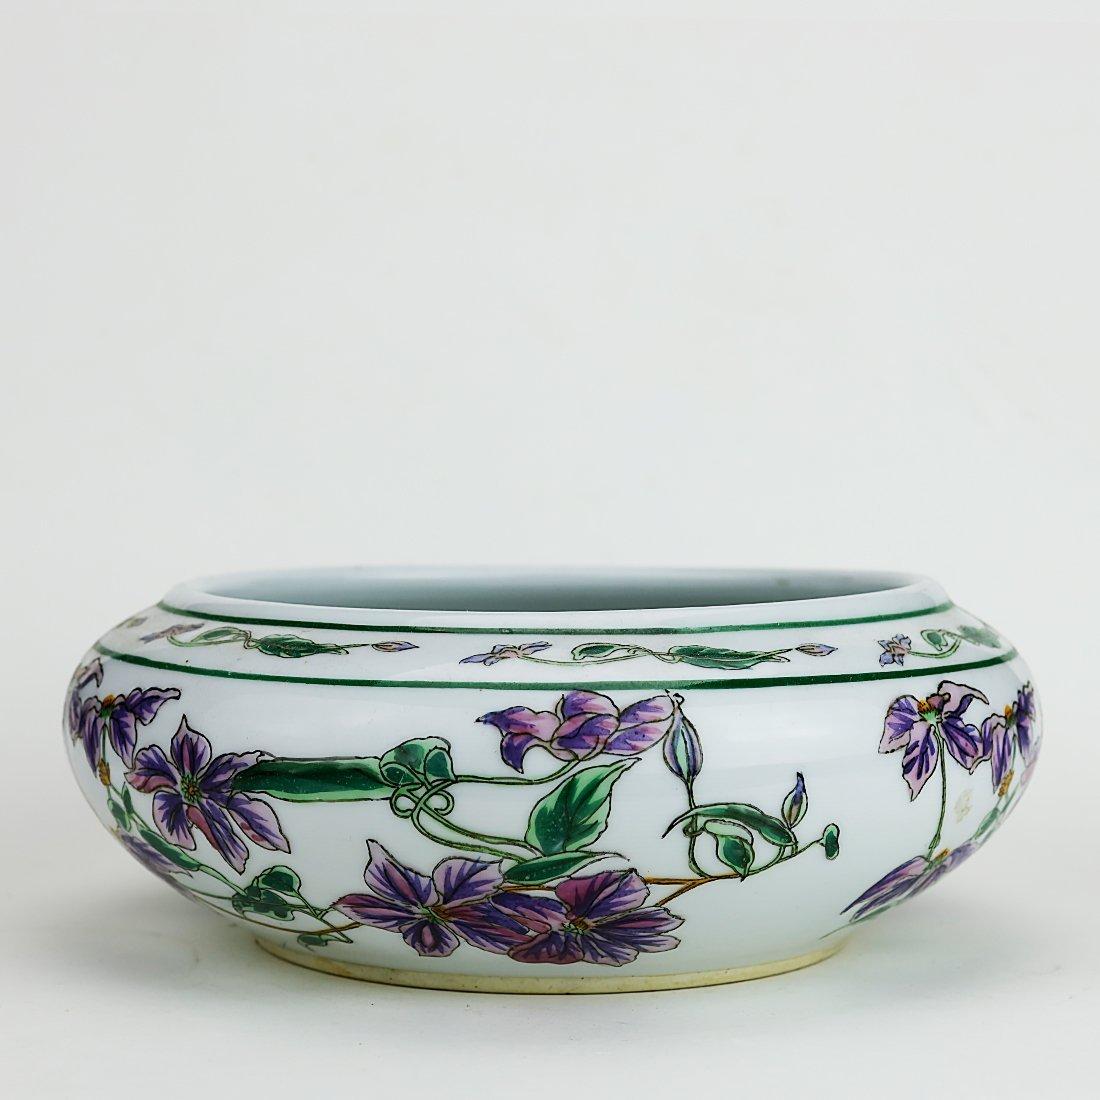 Chinese porcelain writing-brush wash, Jingdezhen - 2